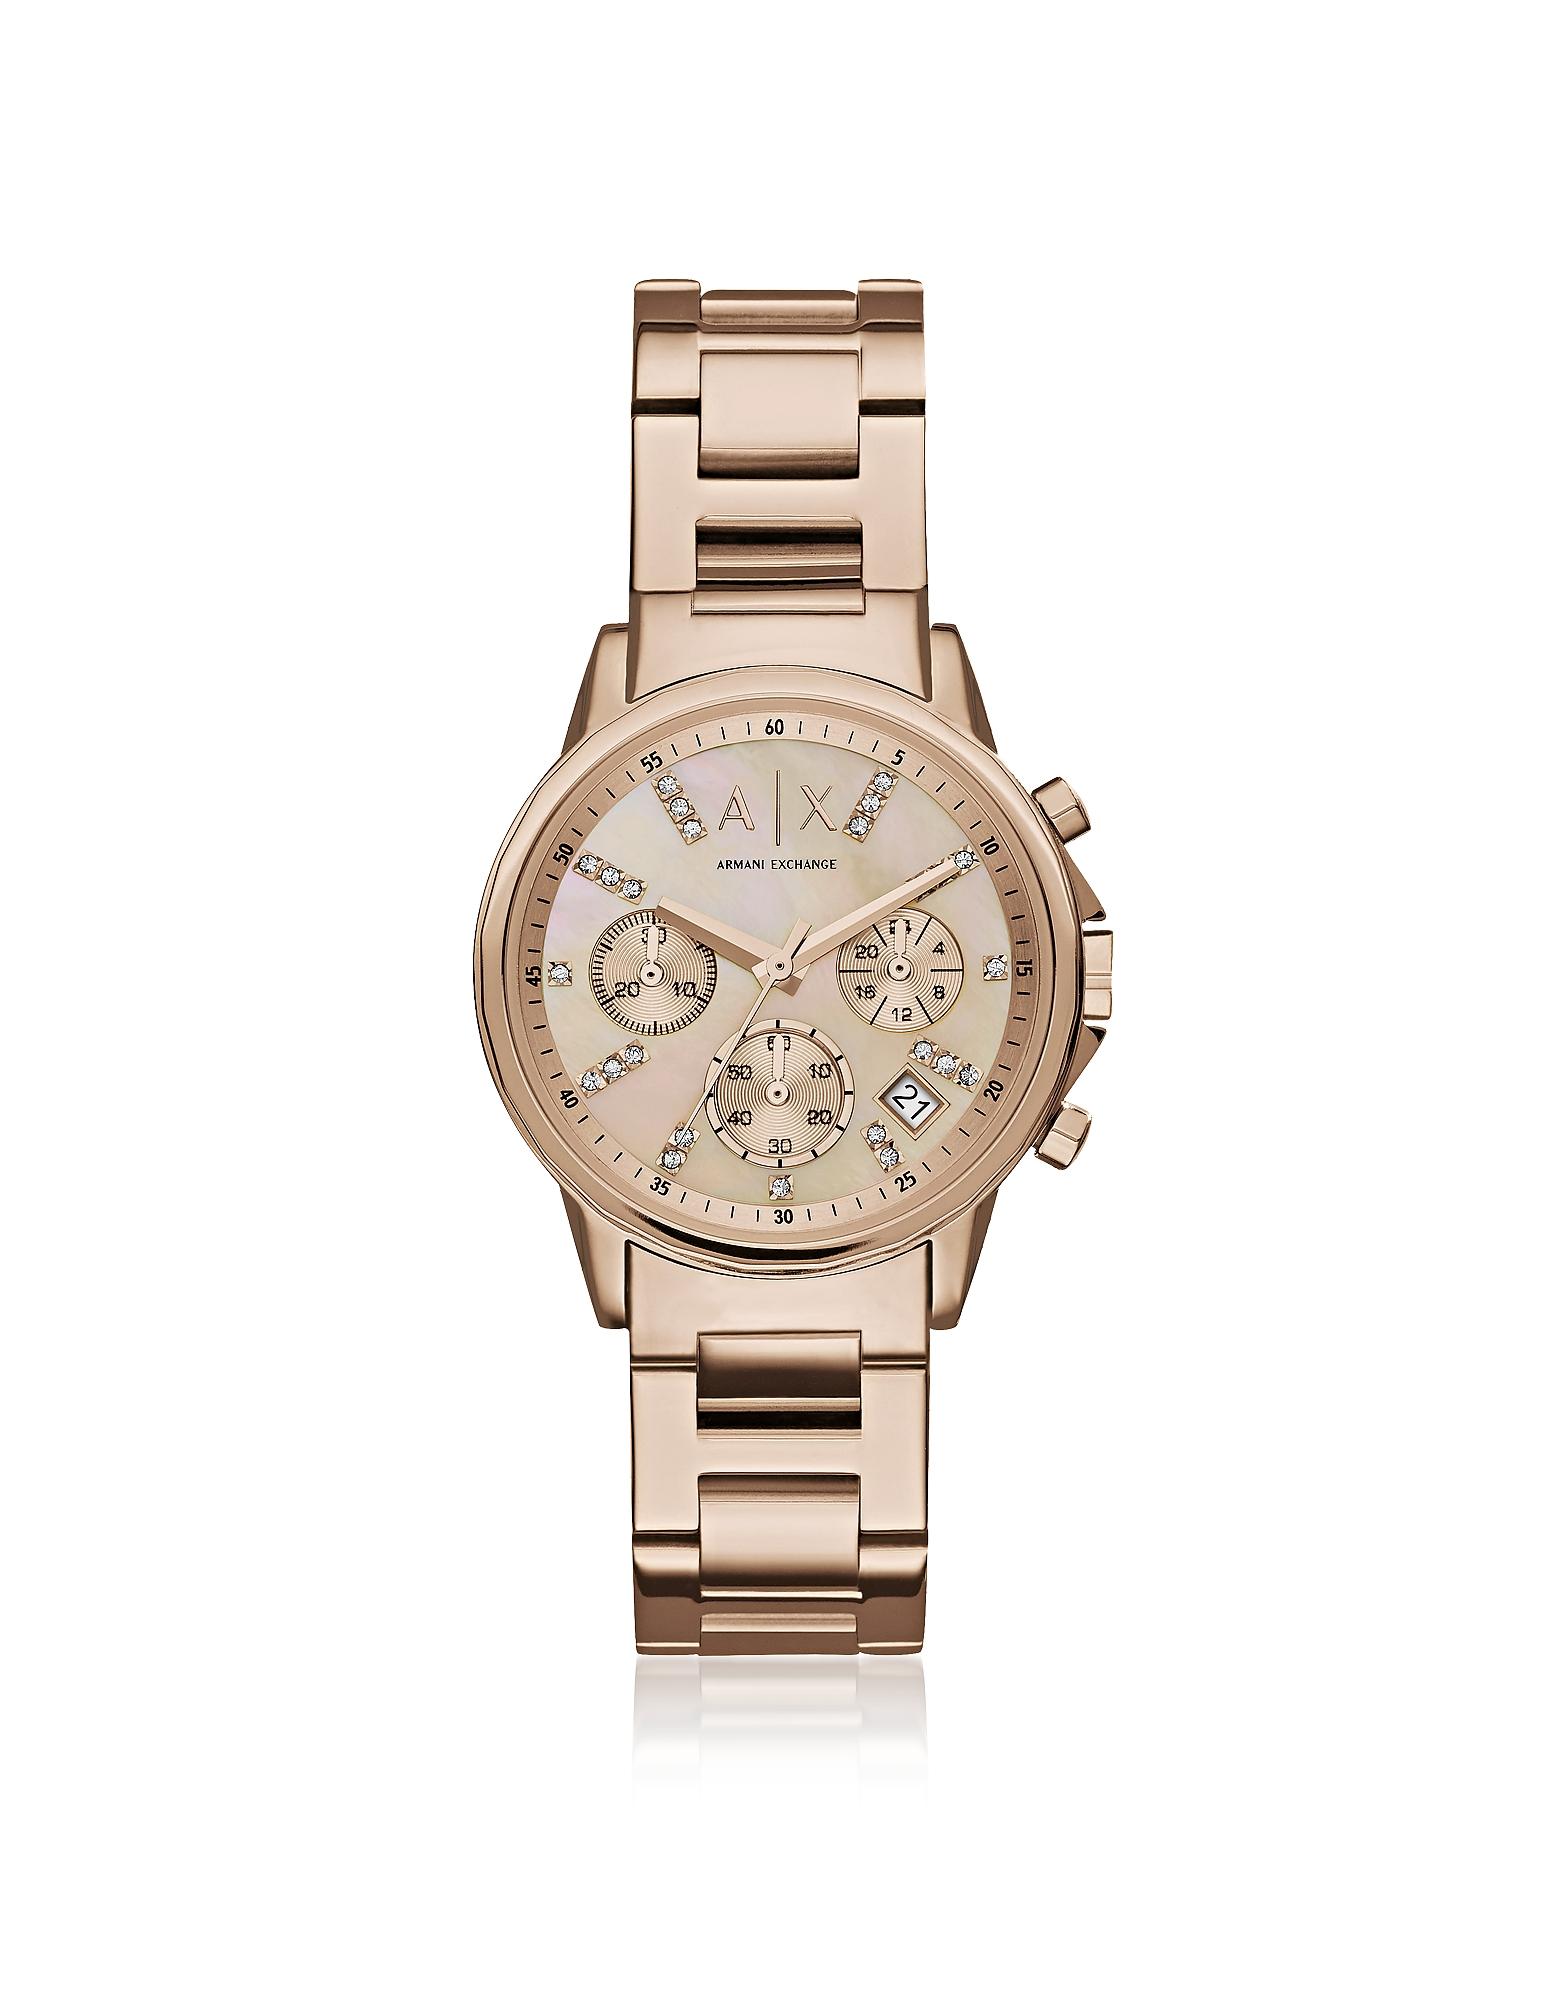 Armani Exchange Women's Watches, Lady Banks Rose Tone Chronograph Women's Watch